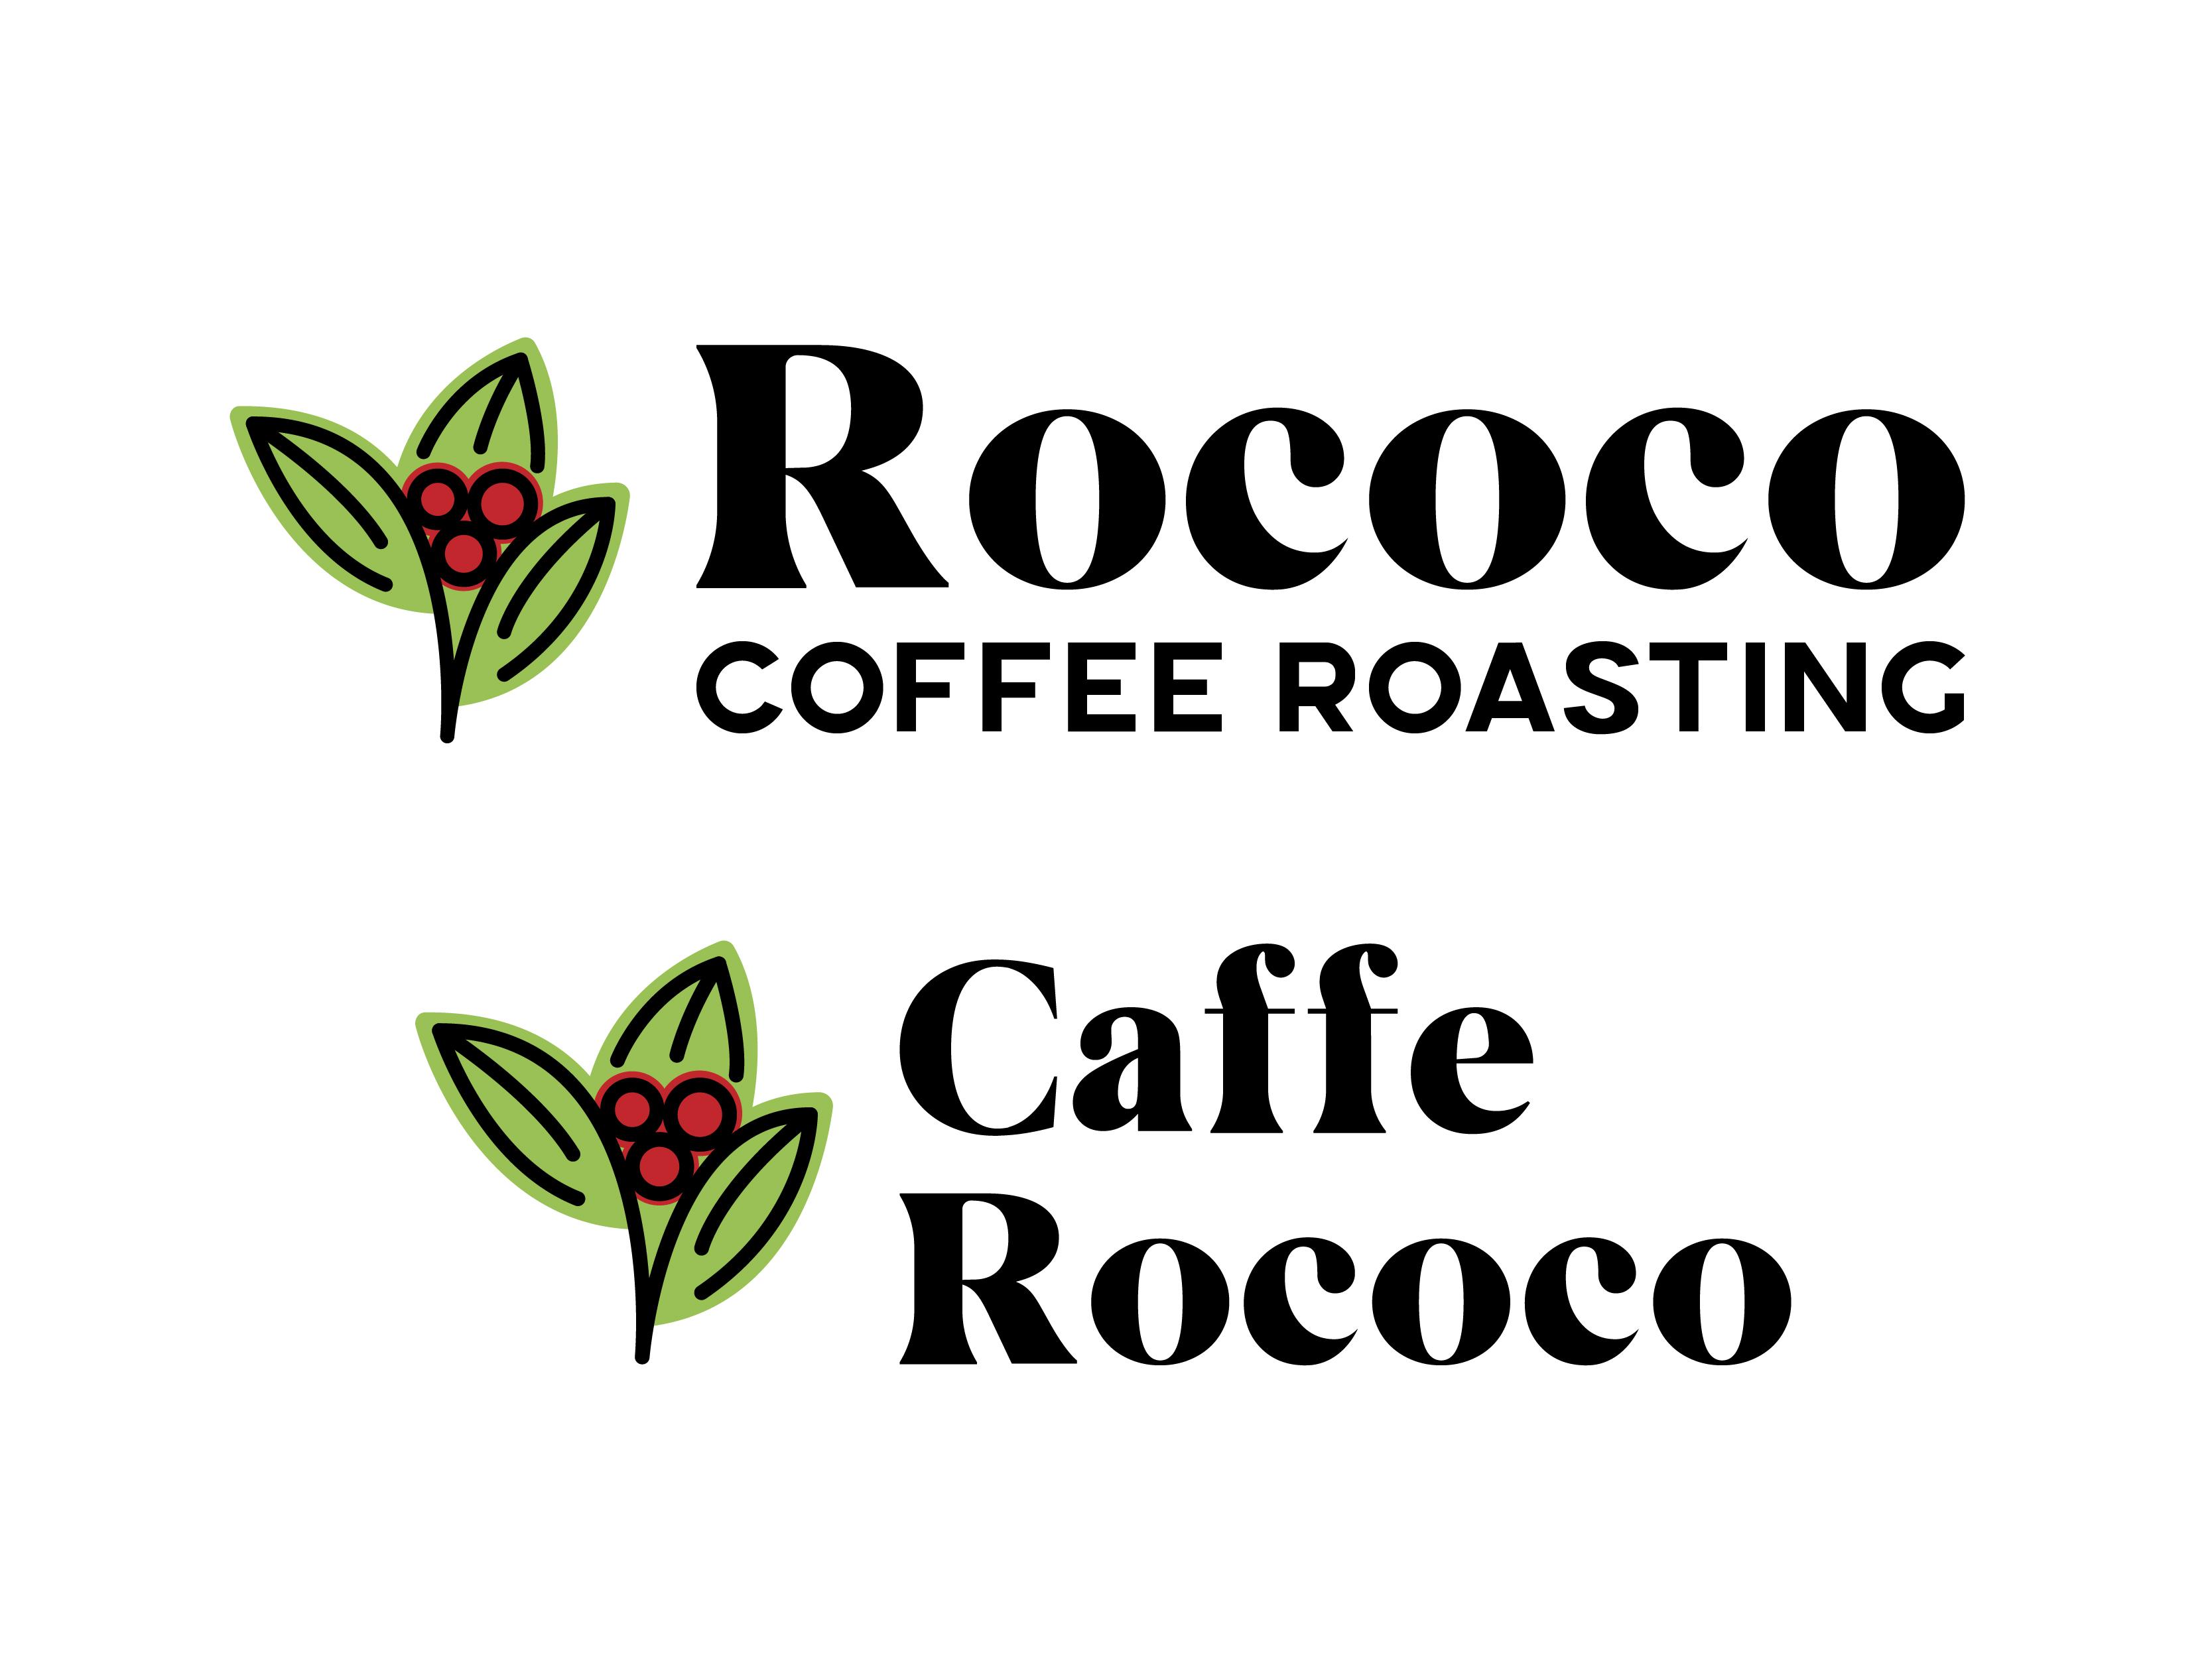 Rococo coffee branding 1